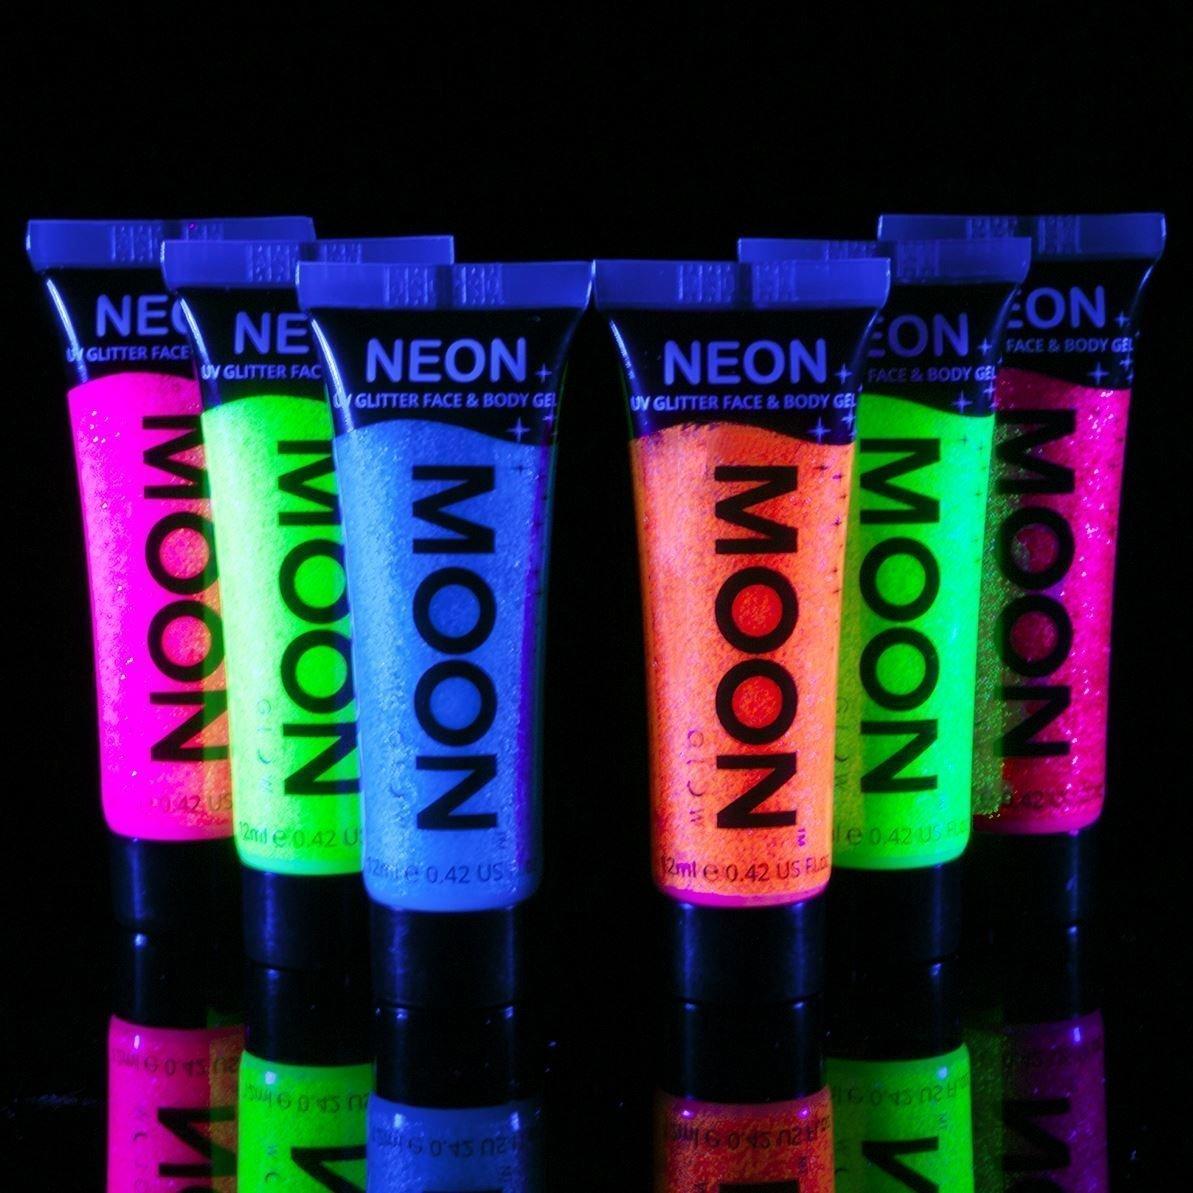 Moon Glow - Blacklight UV Glitter Face & Body Gel - 12ml Set of 6 - Neon - Glows brightly under Blacklight